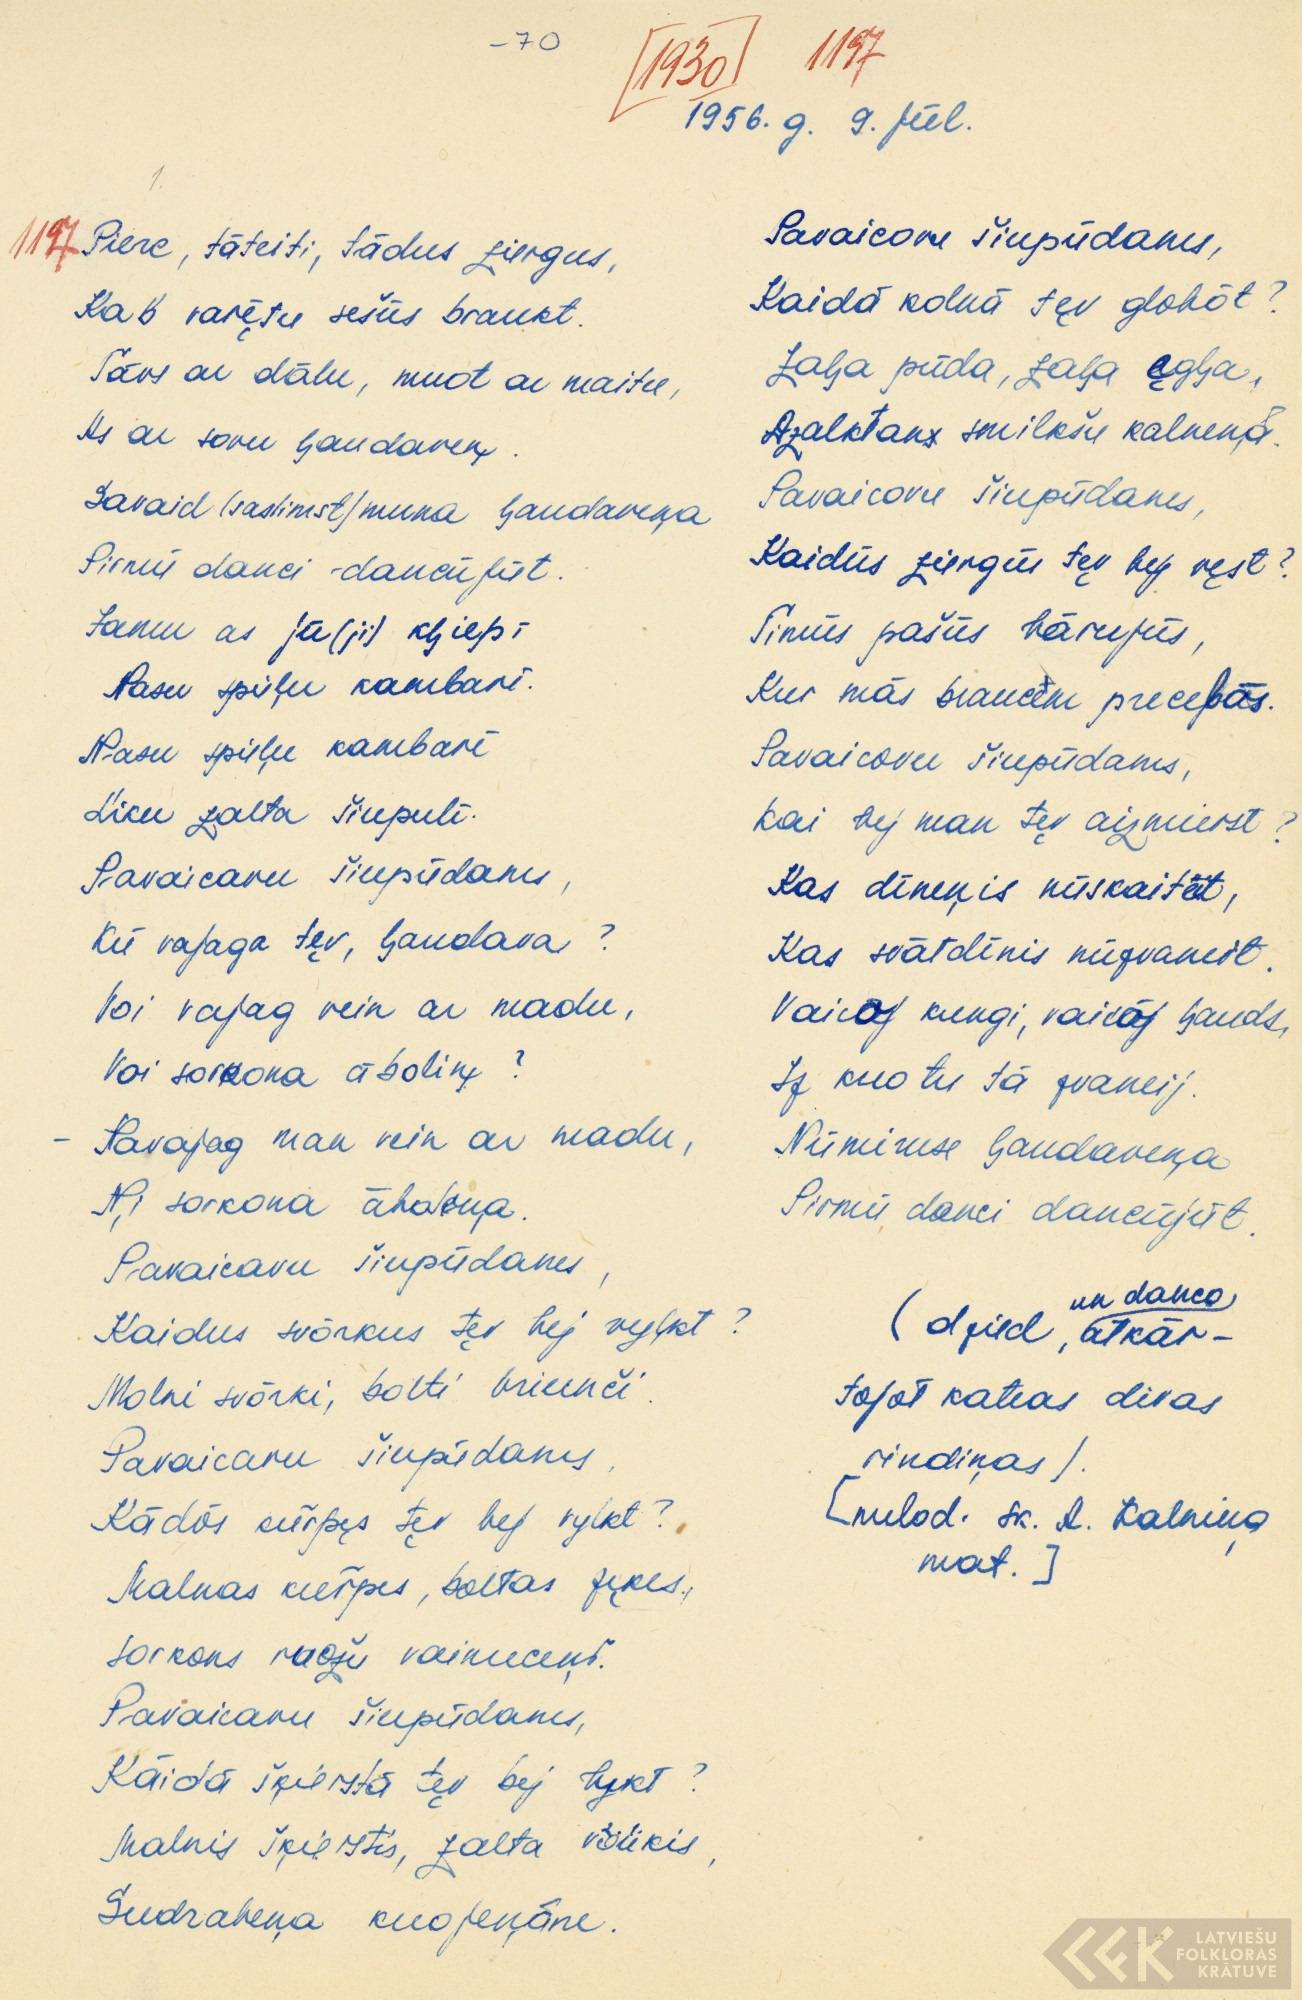 1930-10-zinatniska-ekspedicija-03-0071